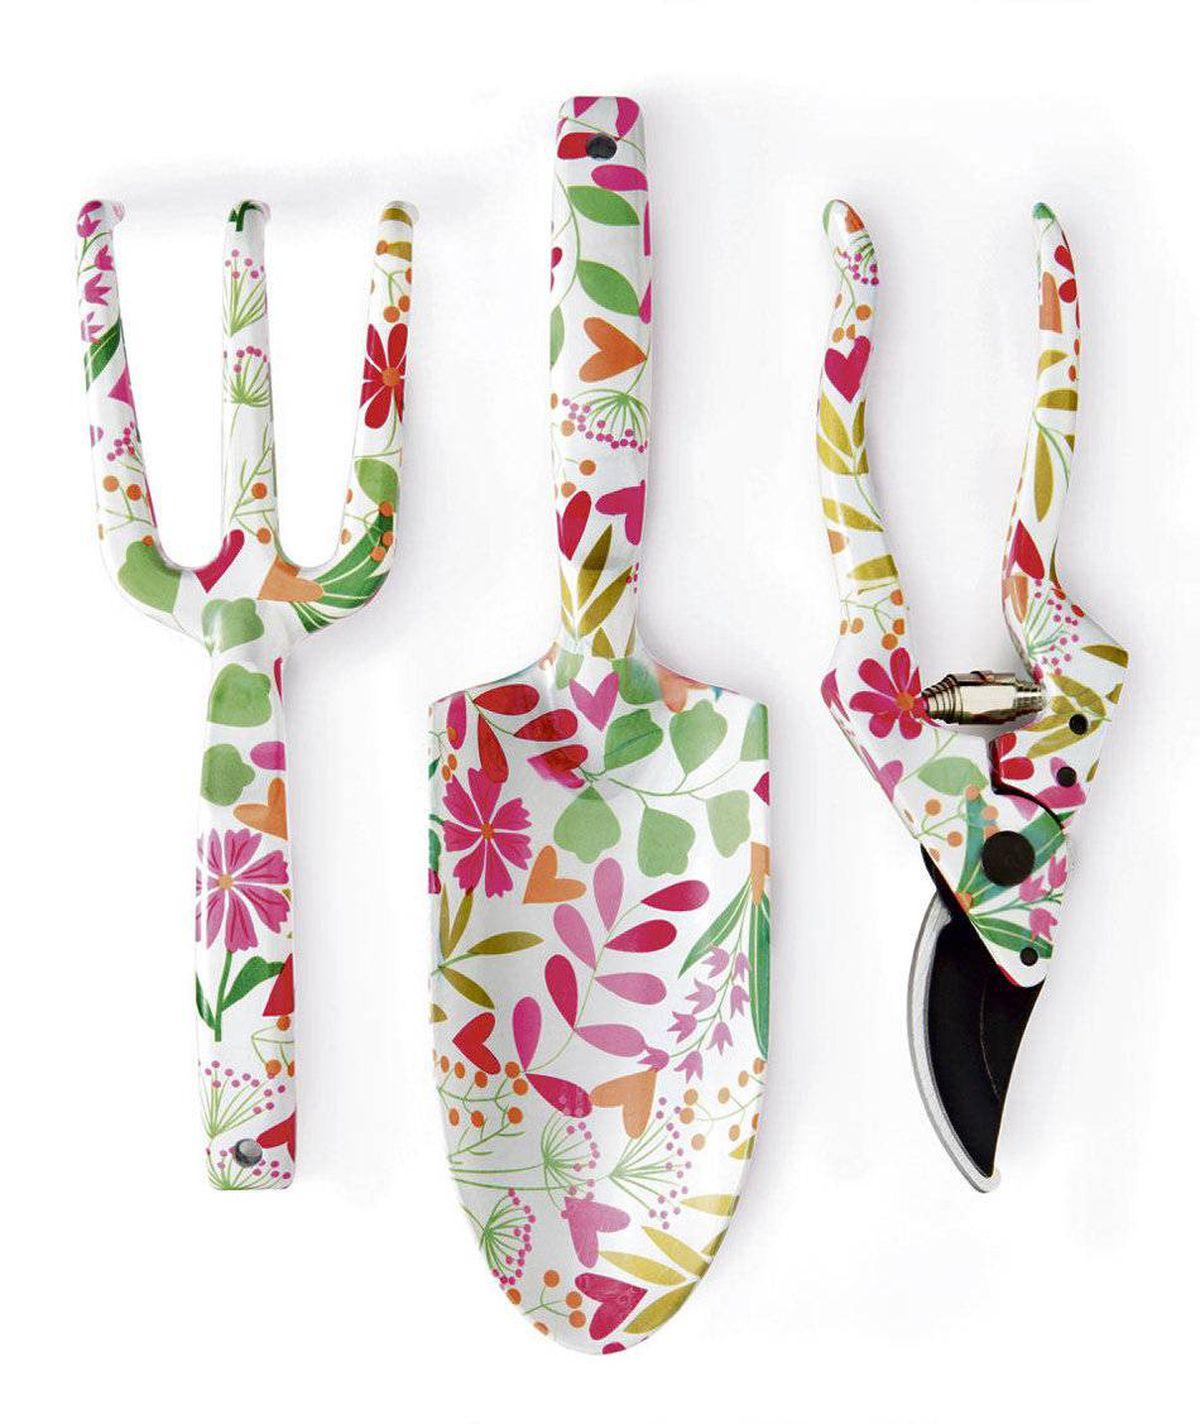 Flower-print gardening-tool set $16.99 at HomeSense (www.homesense.ca)